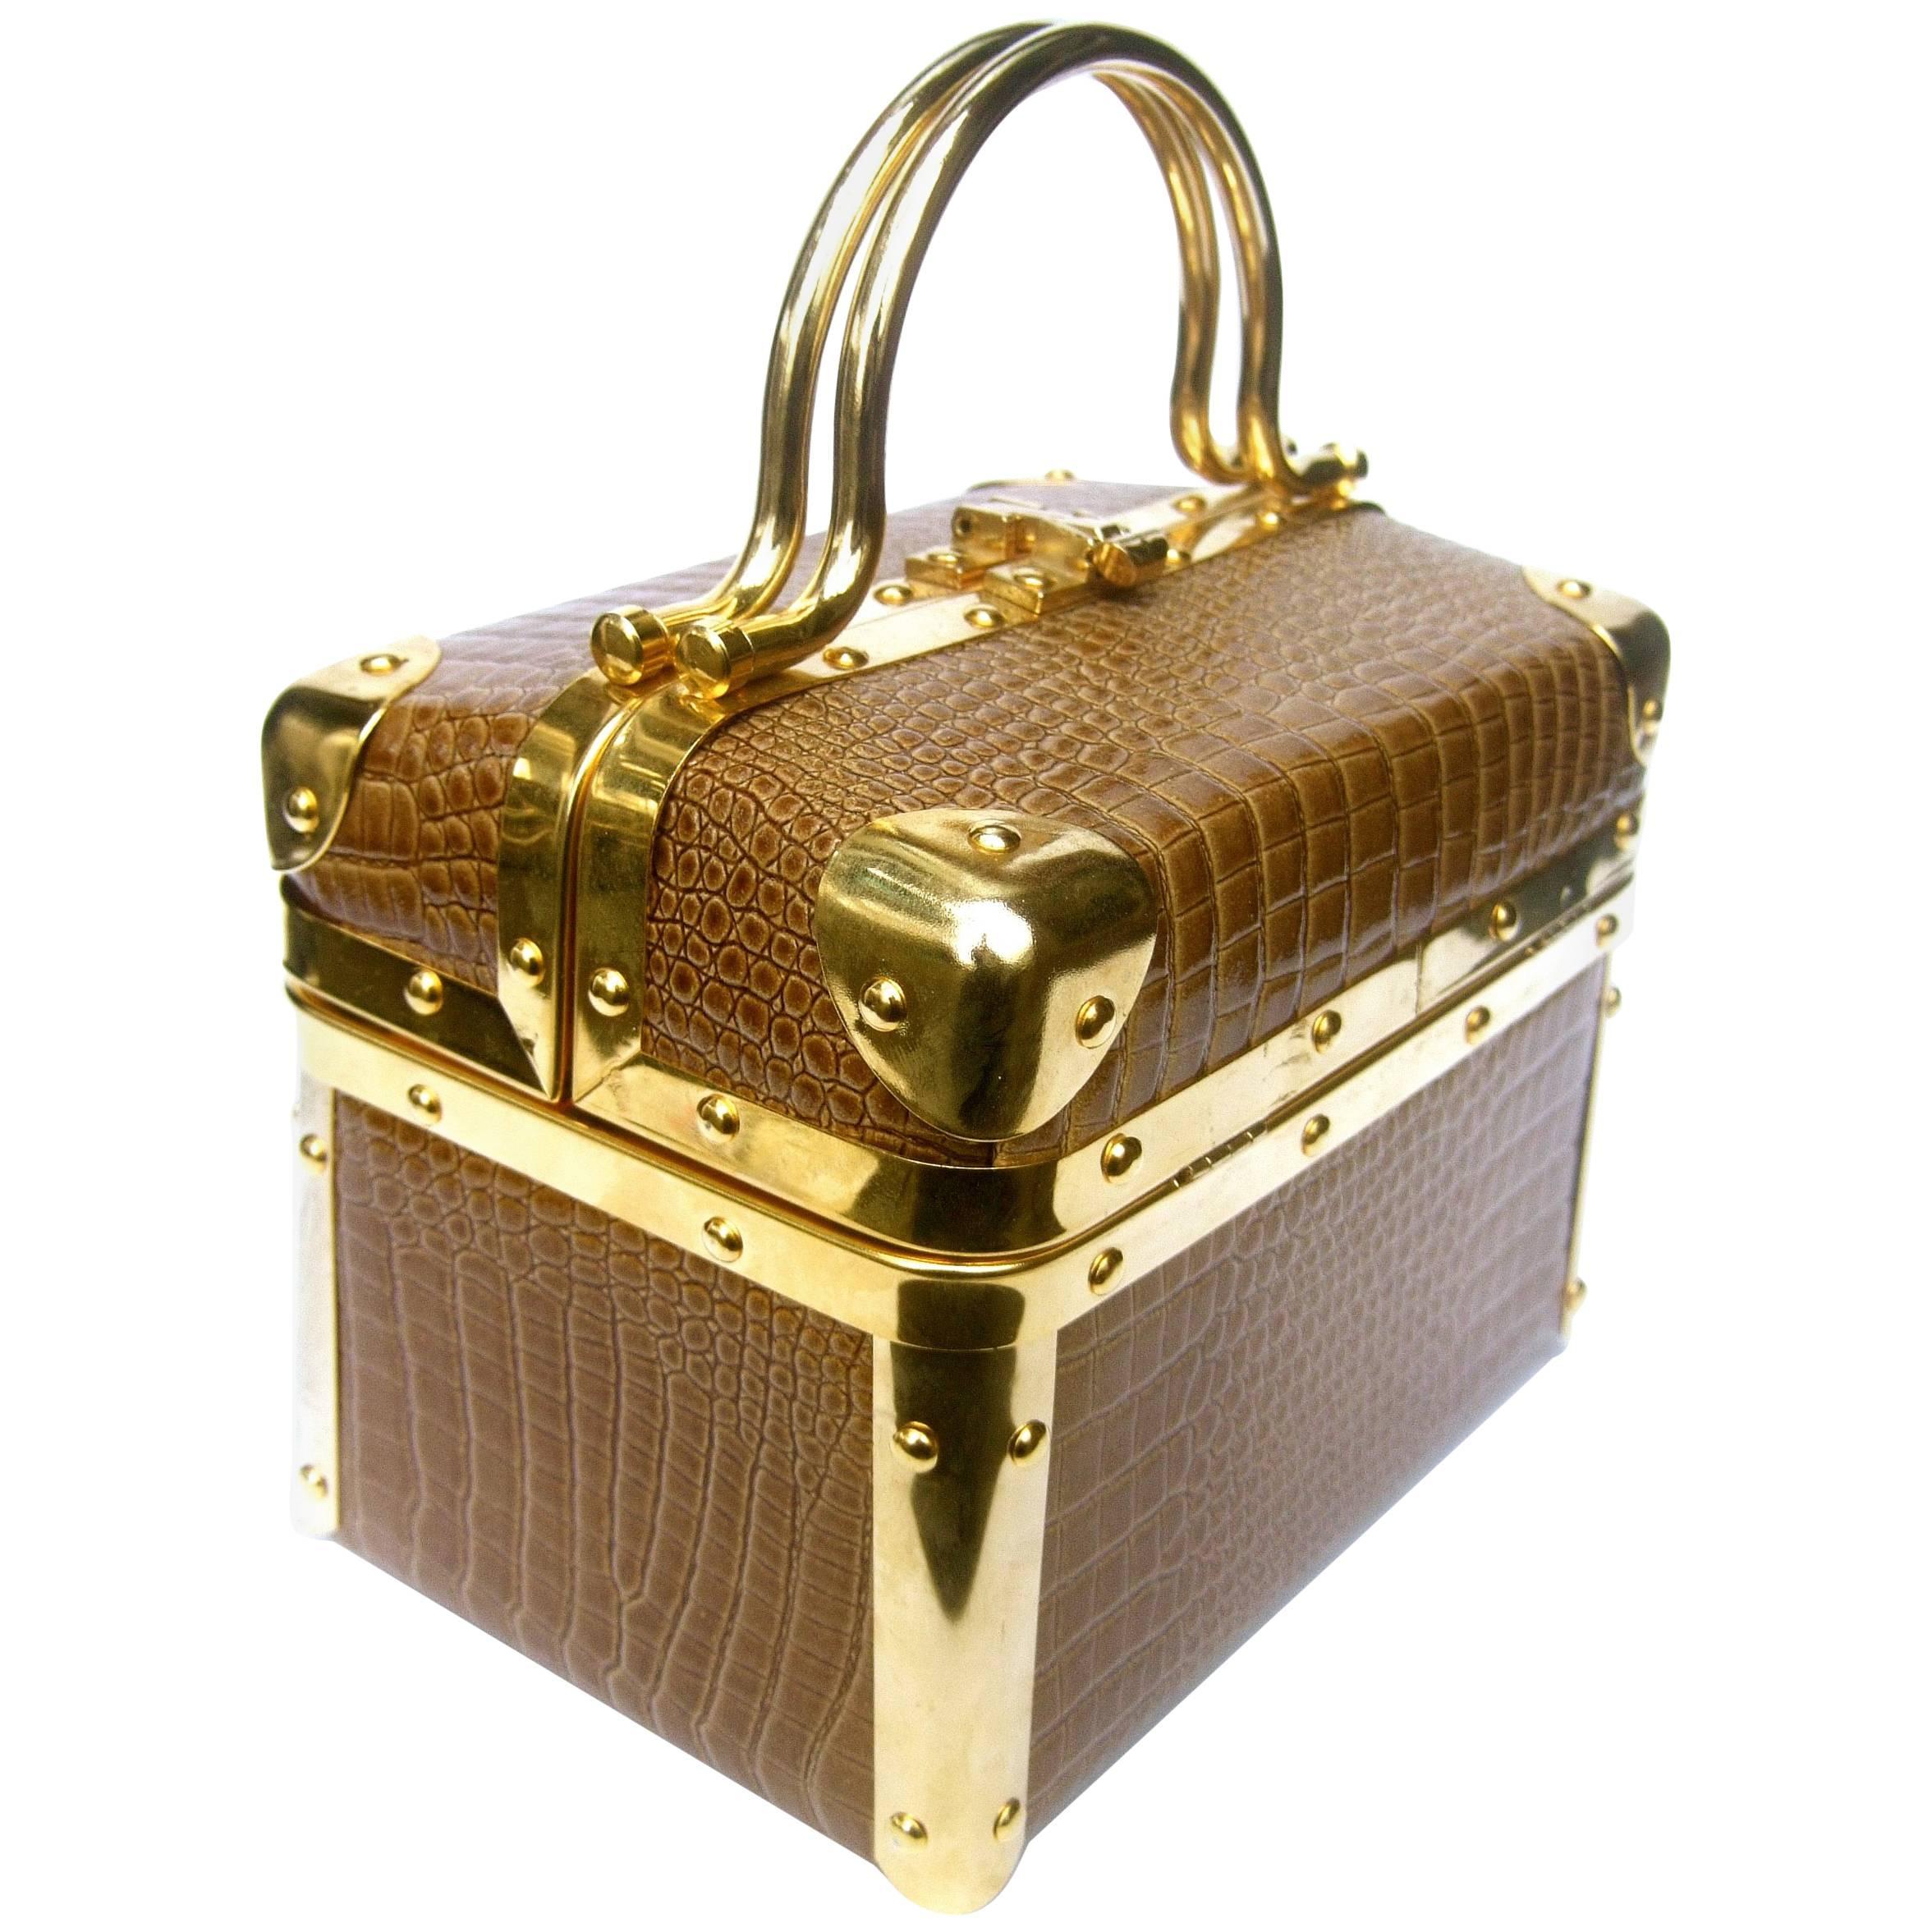 1stdibs Borsa Bella Italy Gold Metallic Embossed Box Purse C 1980s dMnPJF